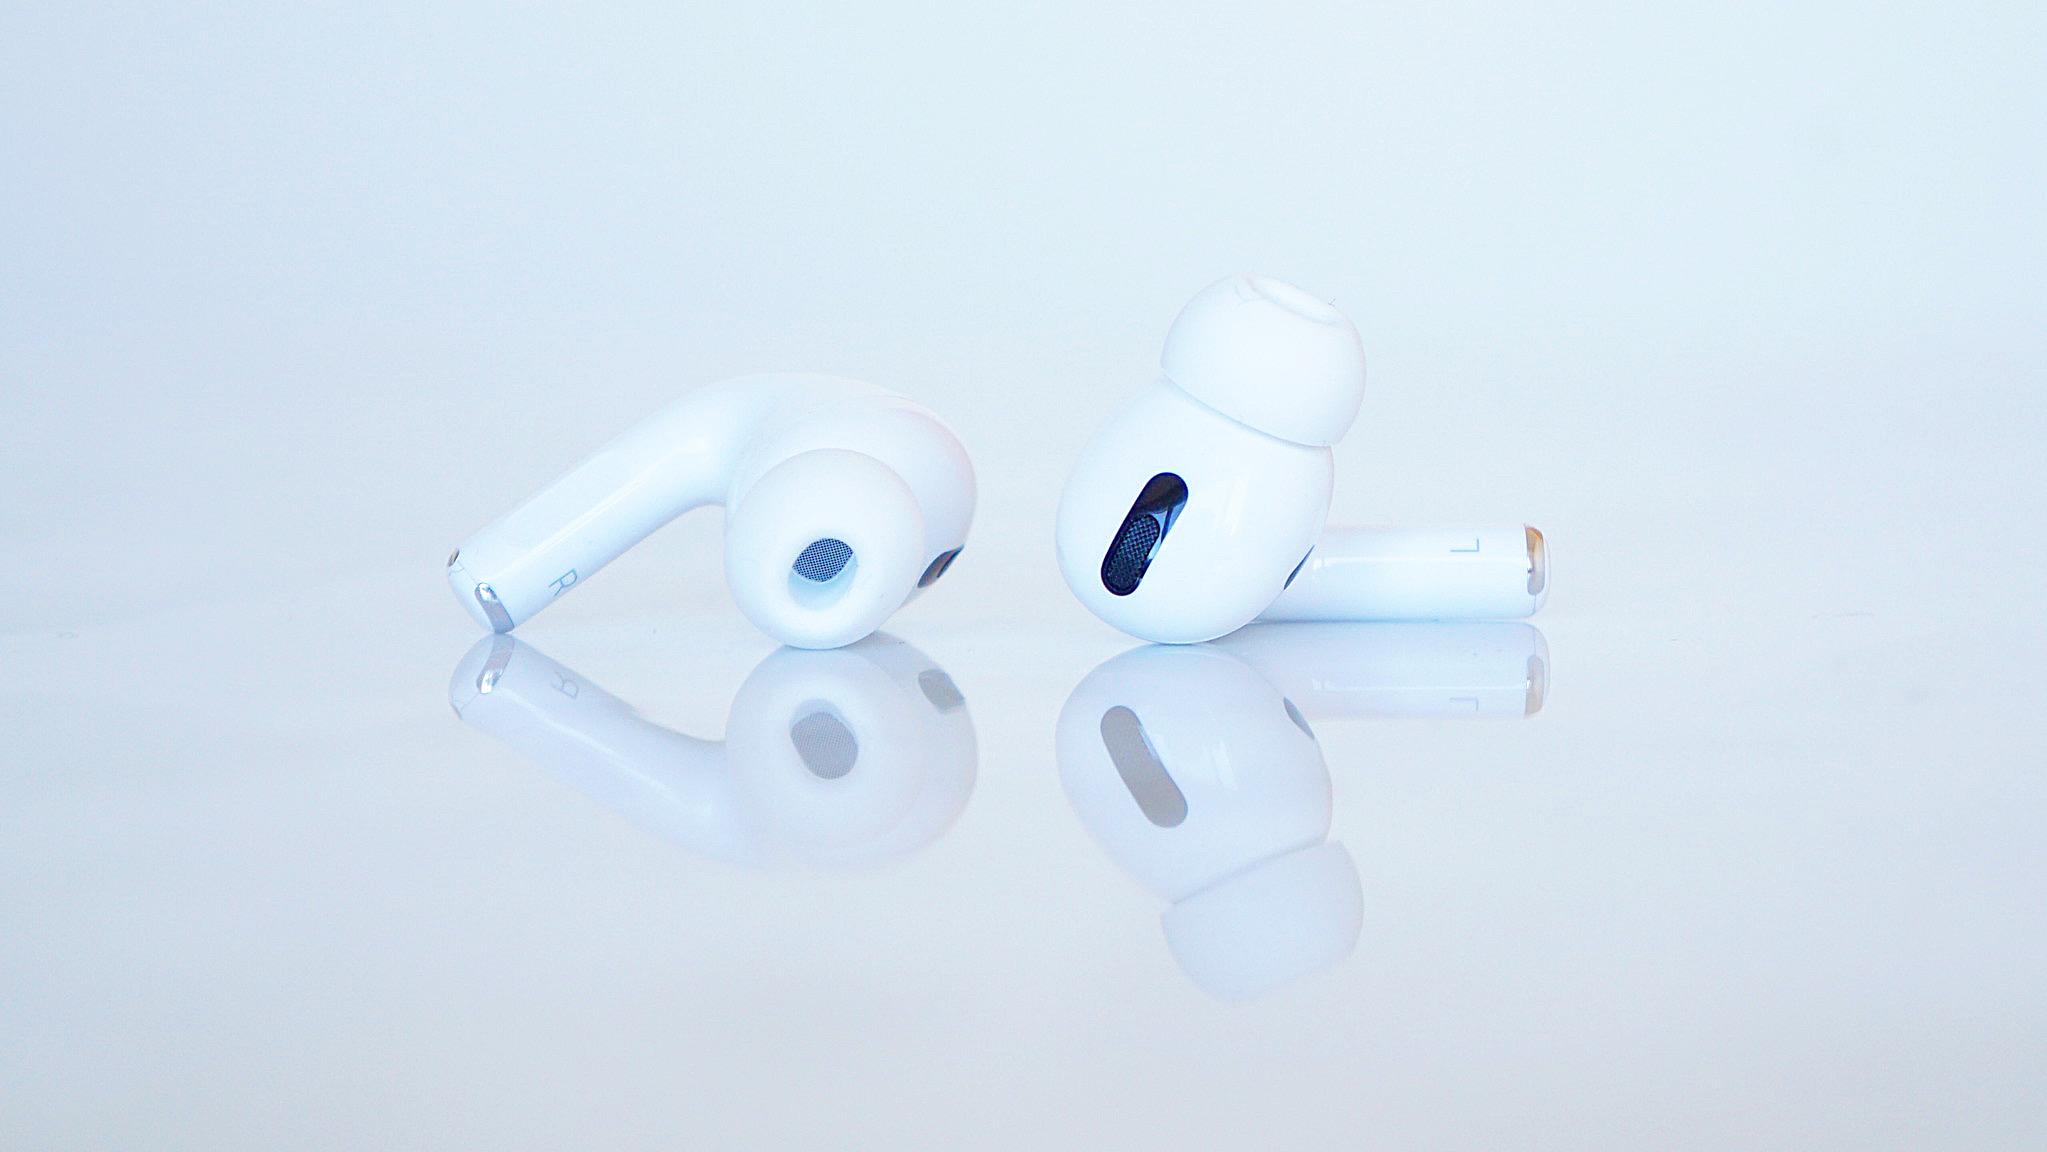 AirPods Proに音問題。ノイズキャンセリングが機能しないなど無償交換に